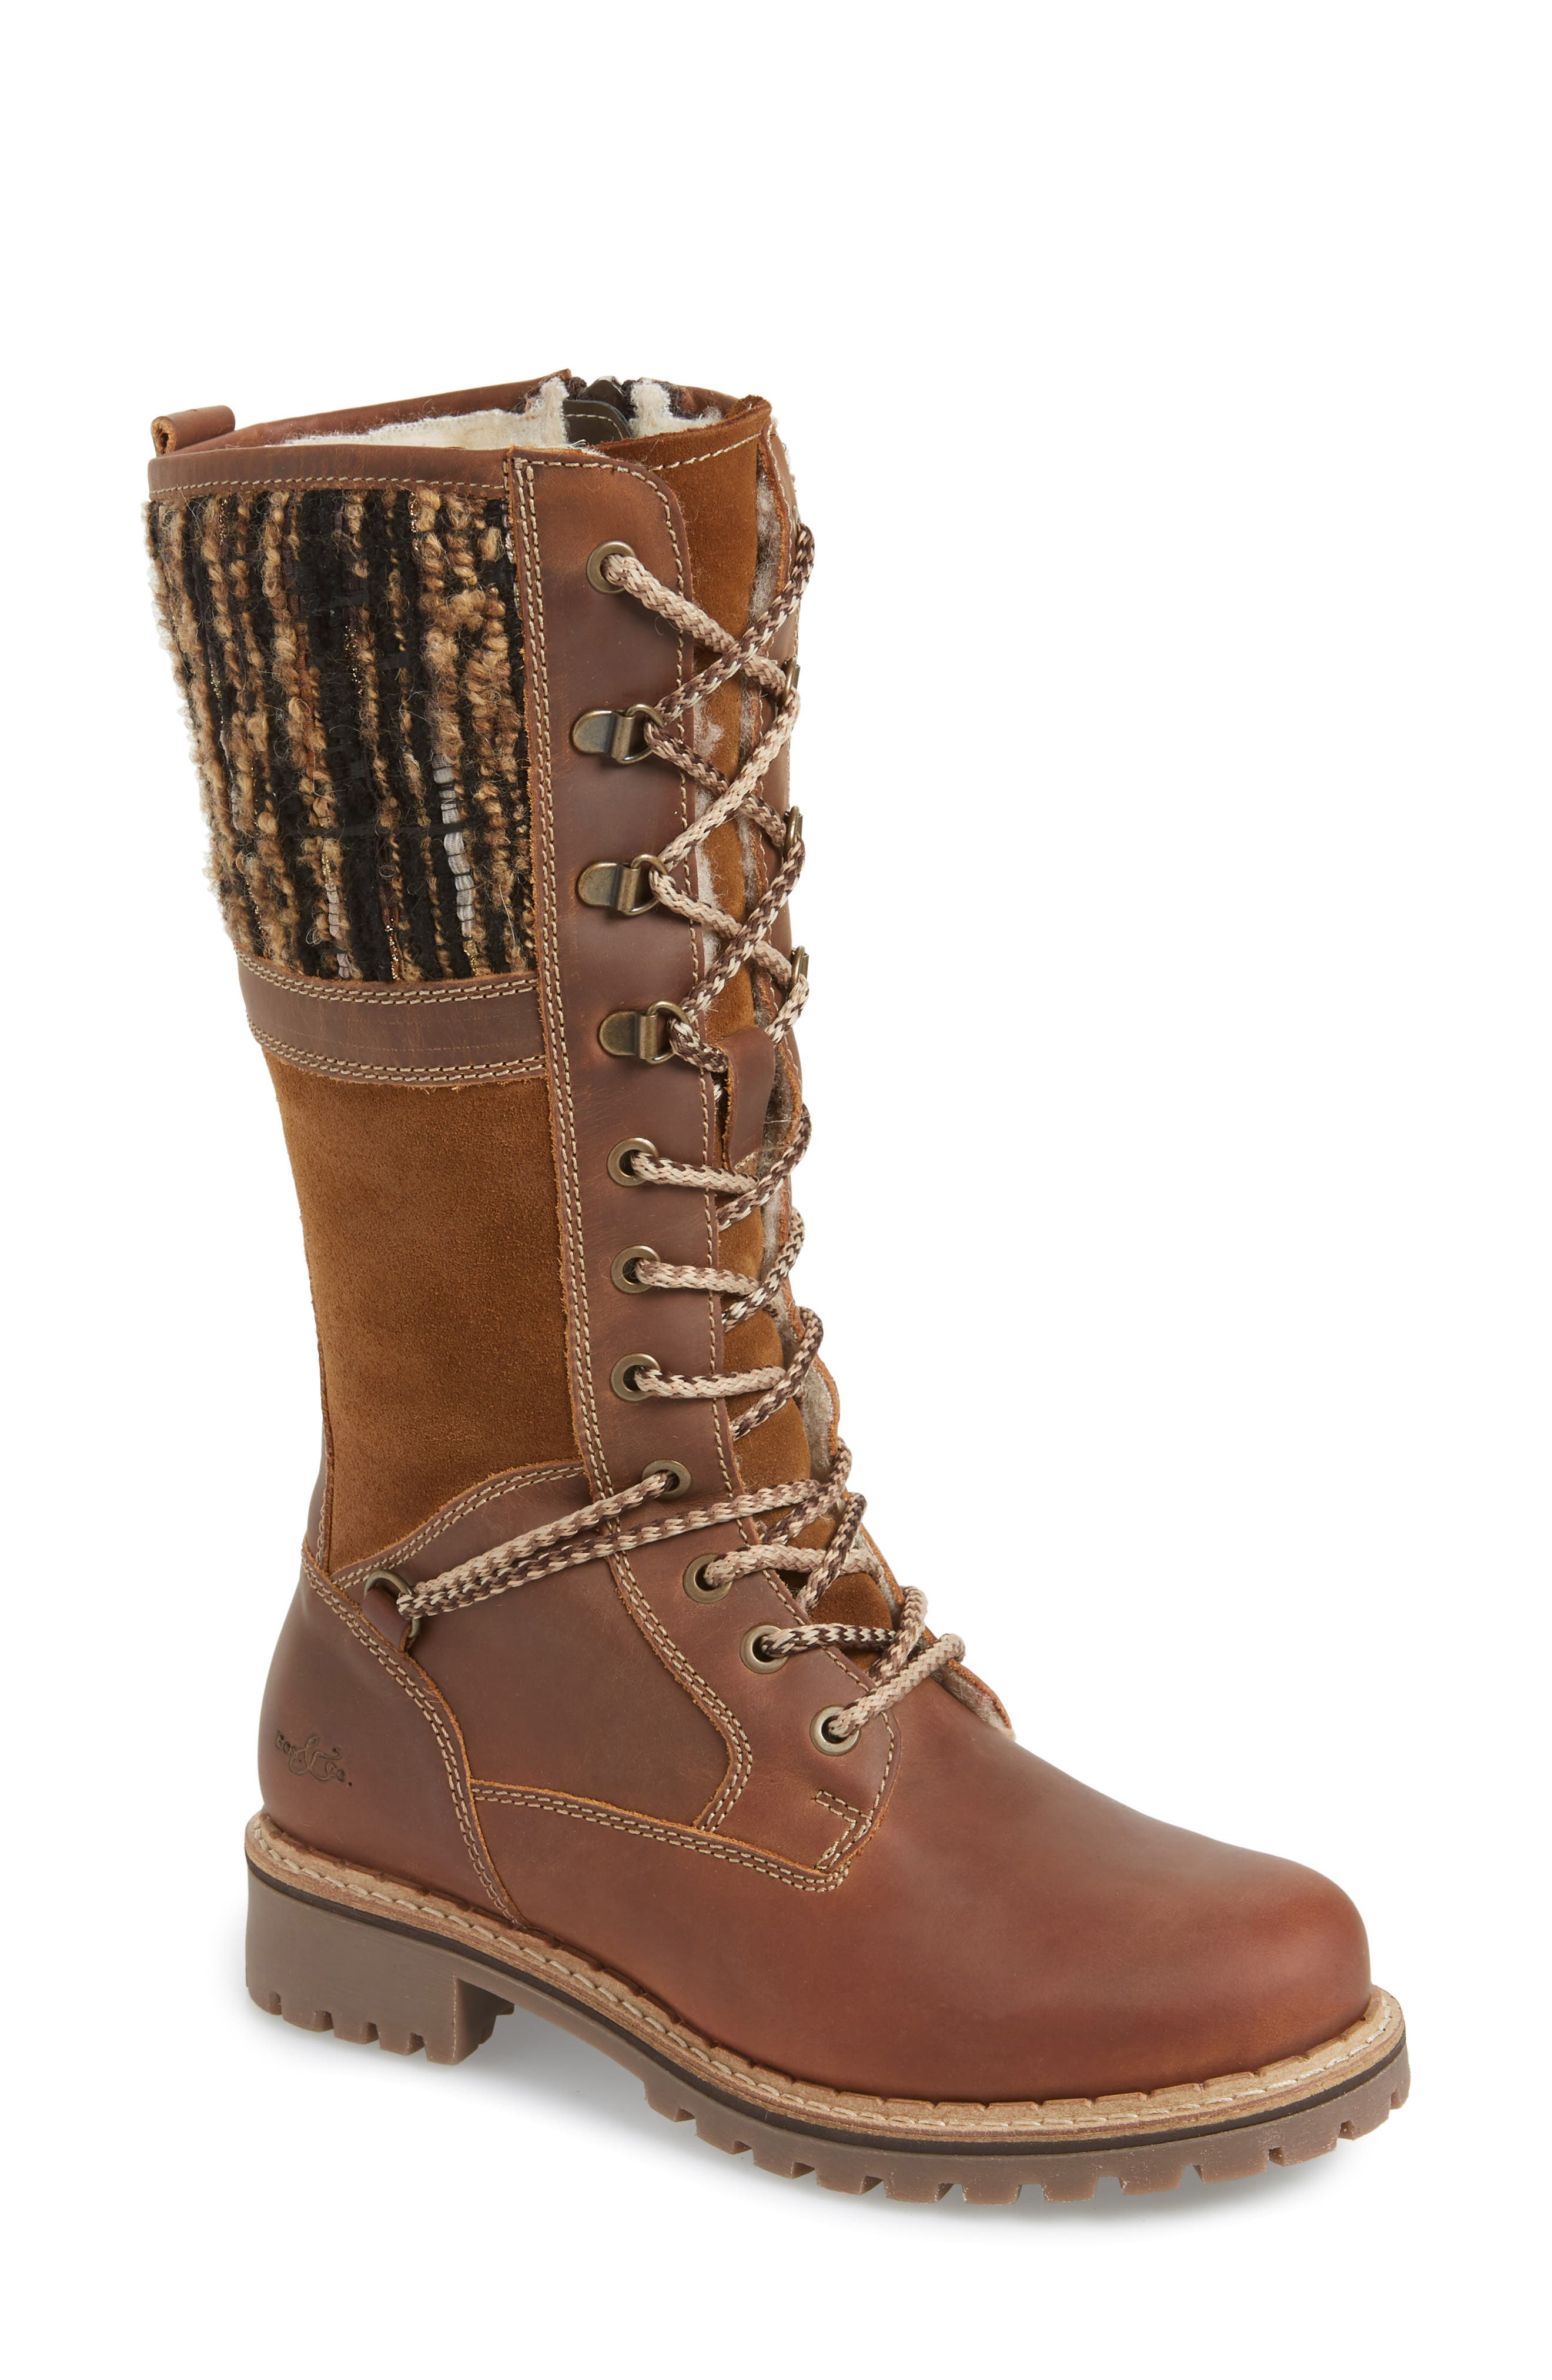 Bos. & Co. Holland Waterproof Boot - Beige